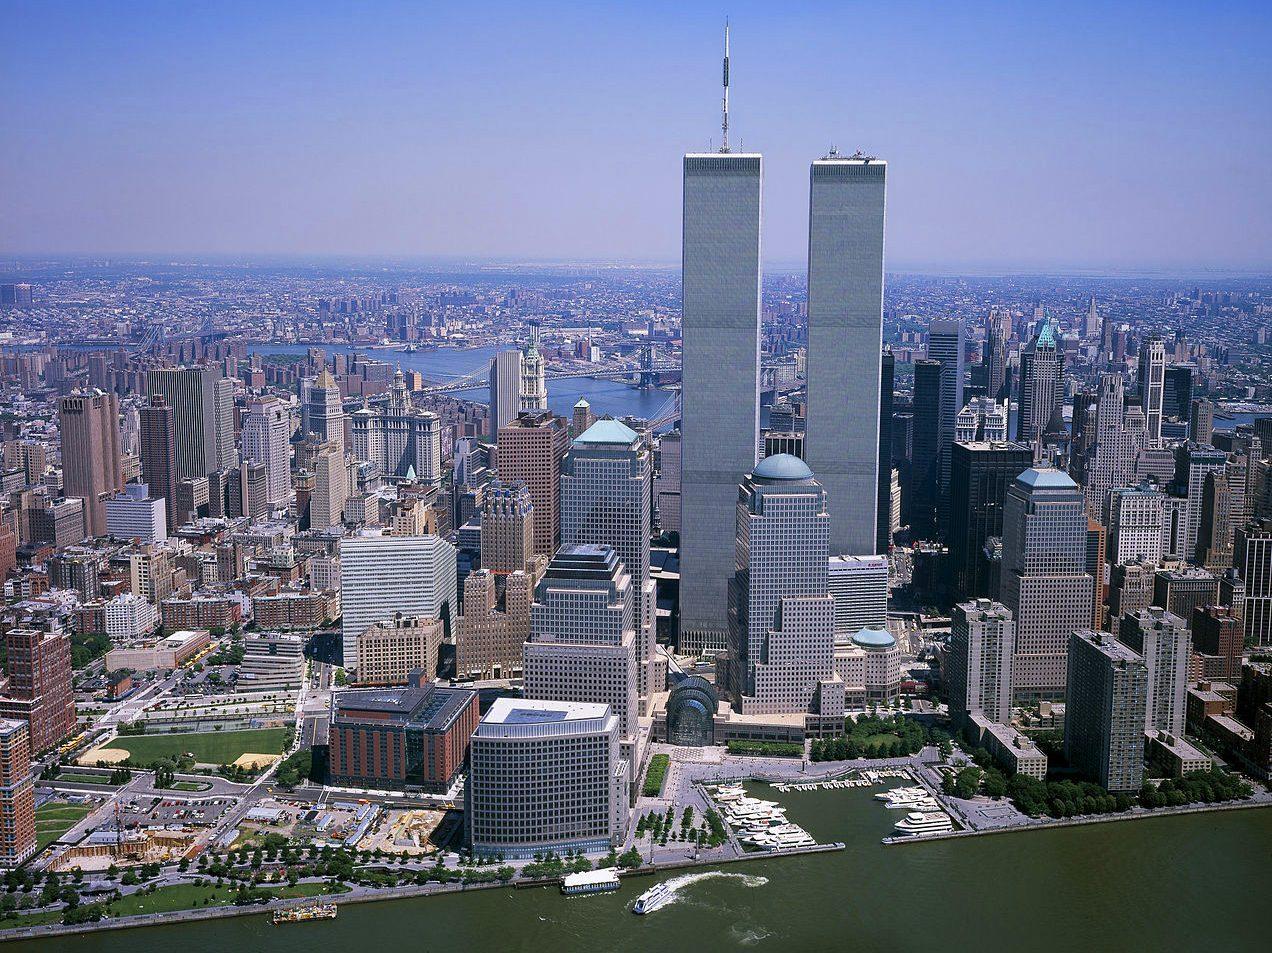 Twin Towers, les anciennes tours jumelles du World Trade Center